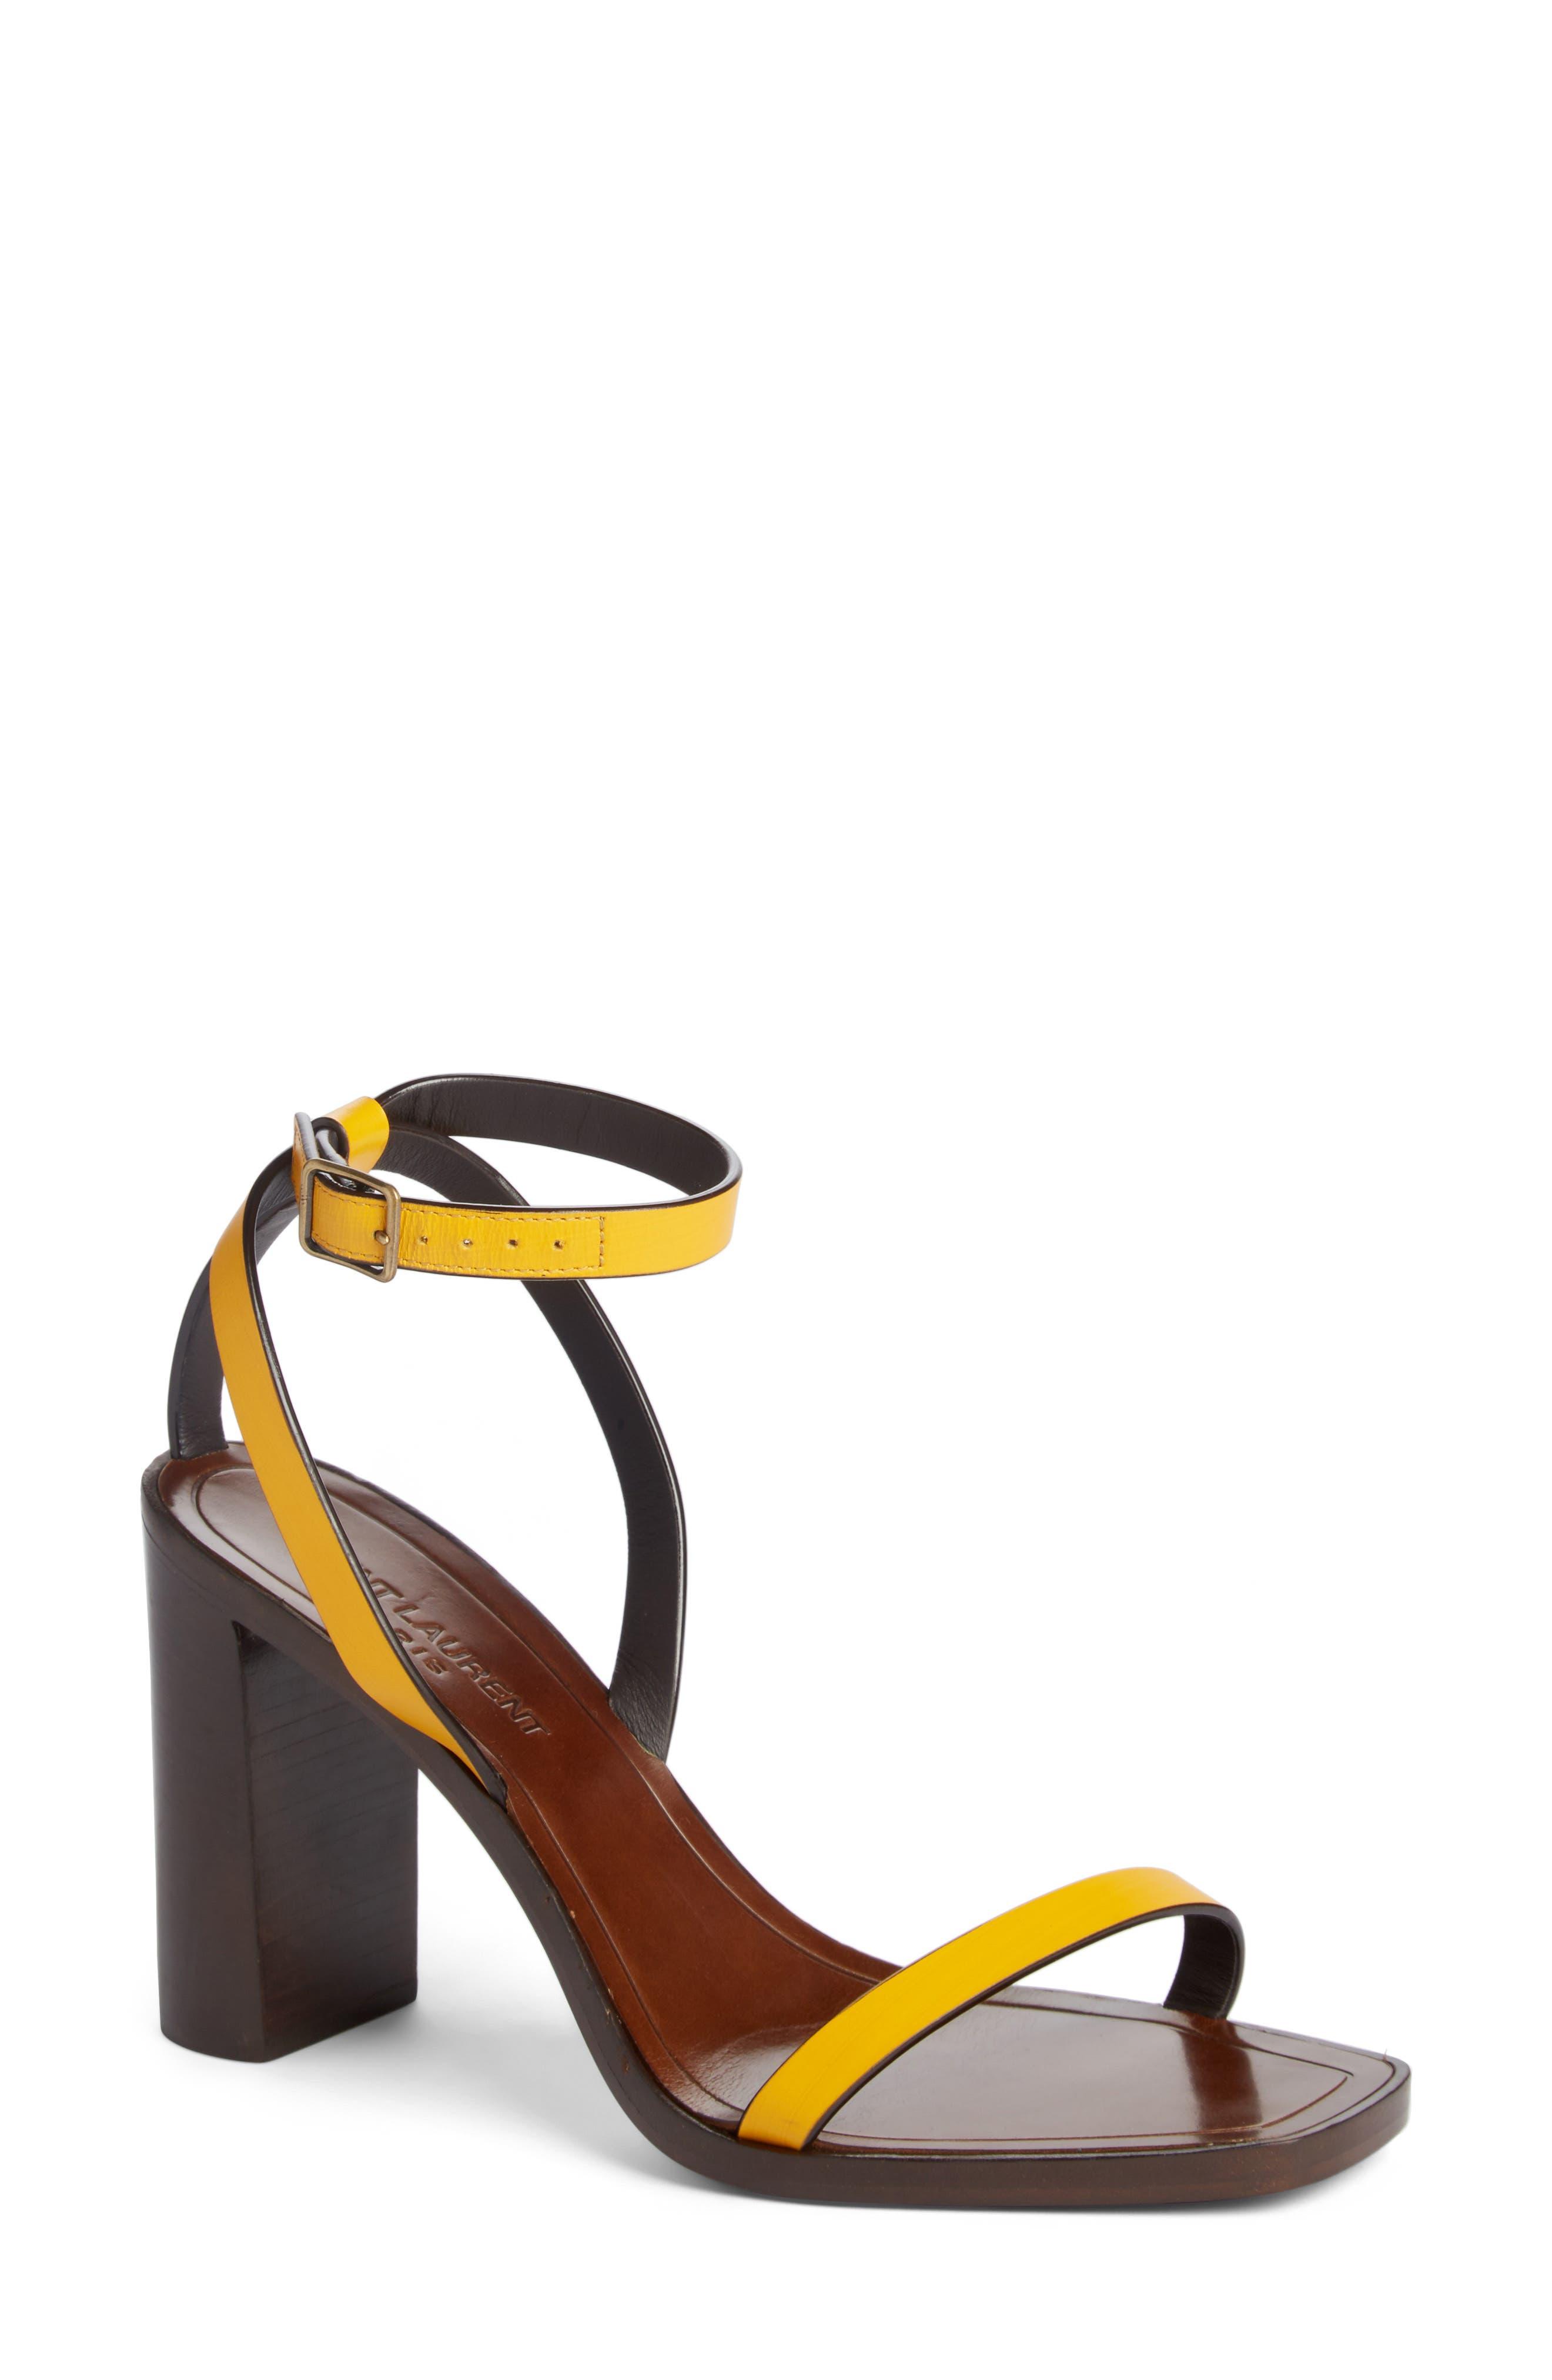 Loulou Ankle Strap Sandal,                             Main thumbnail 1, color,                             Black/ Yellow